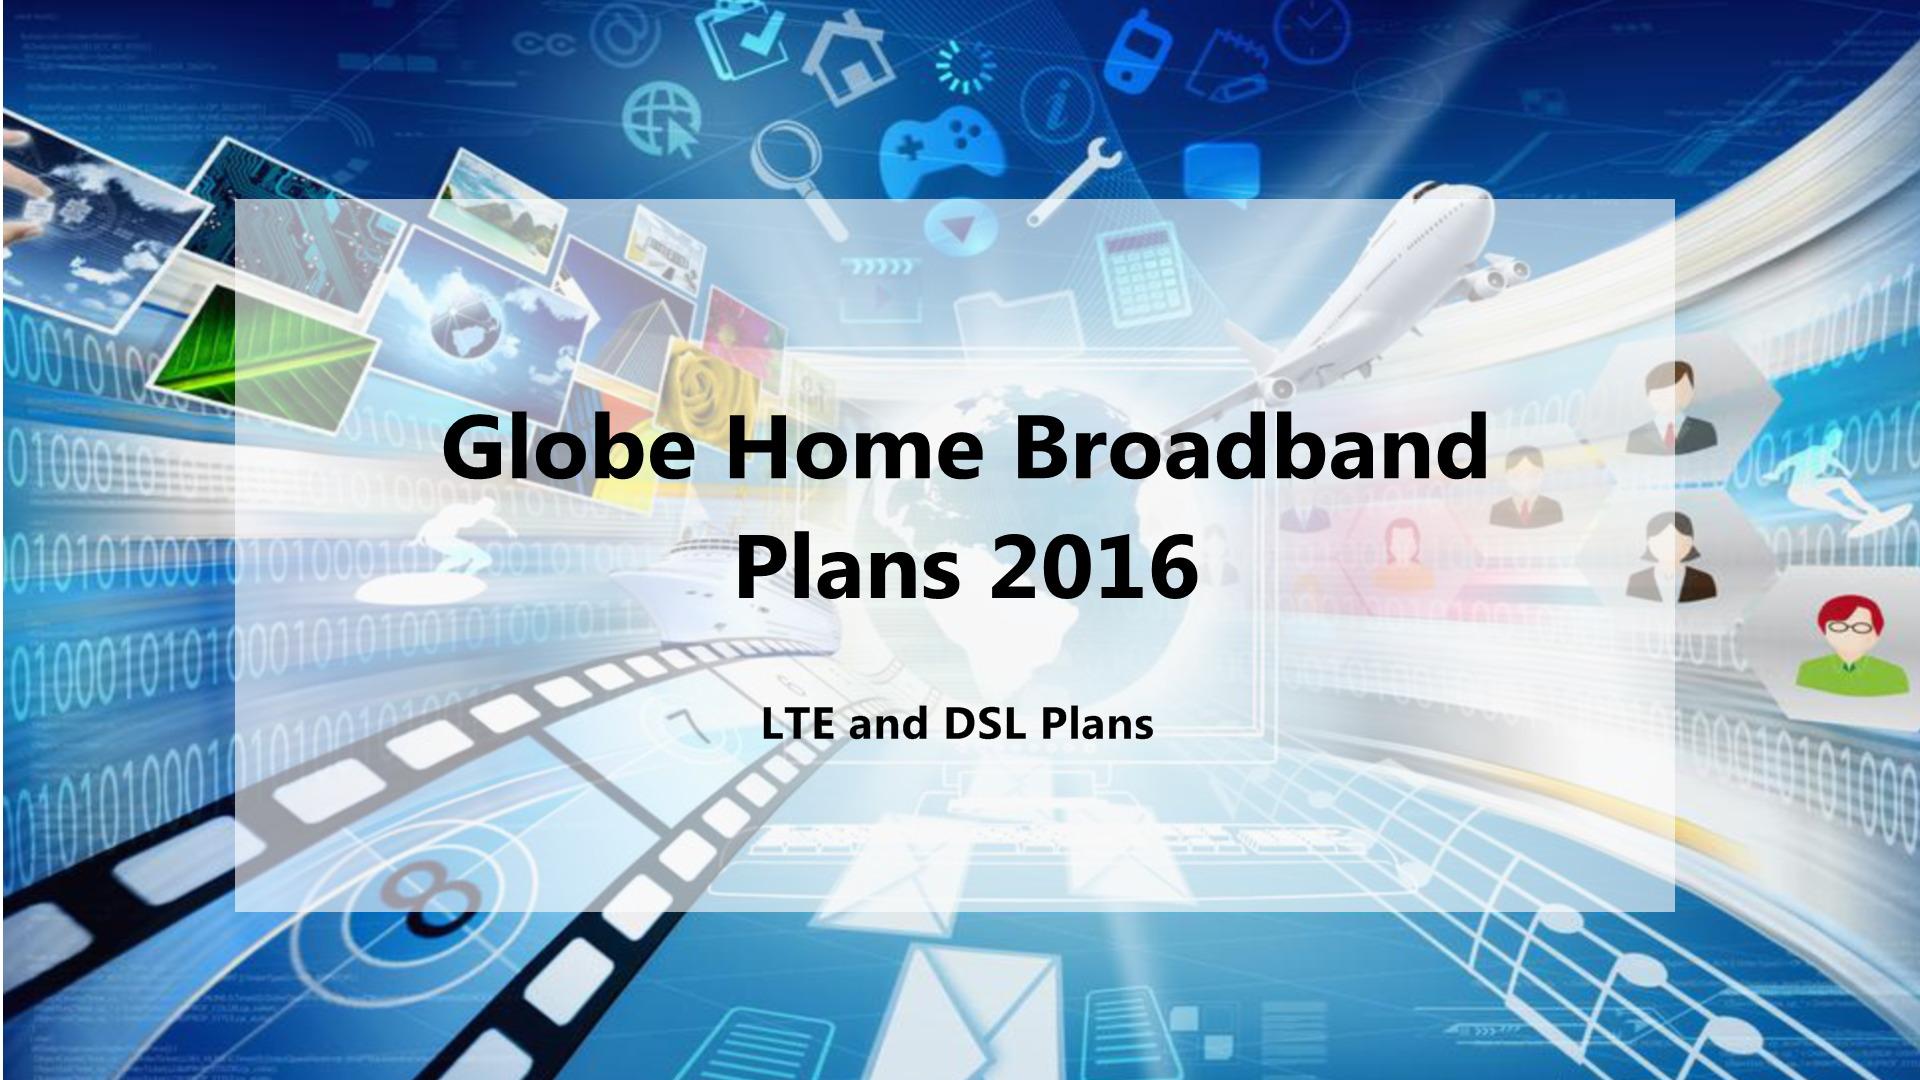 Globe Home Broadband Plans 2016